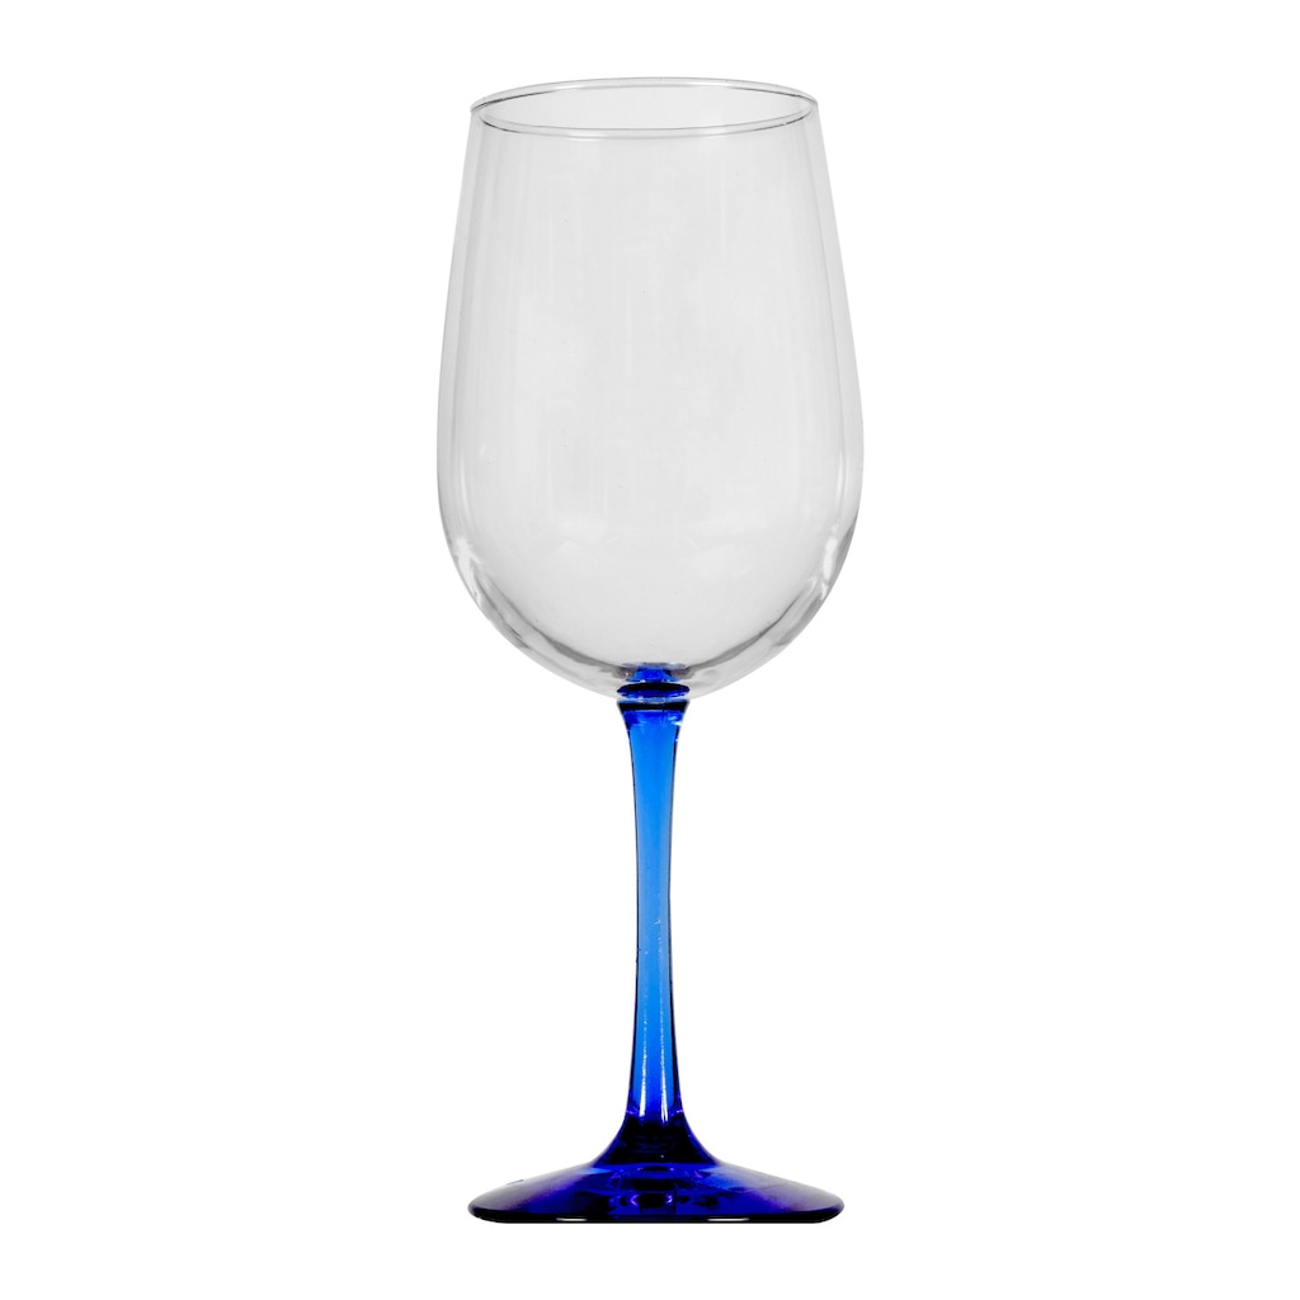 Blue Stem Wine Gles 18 5 Oz